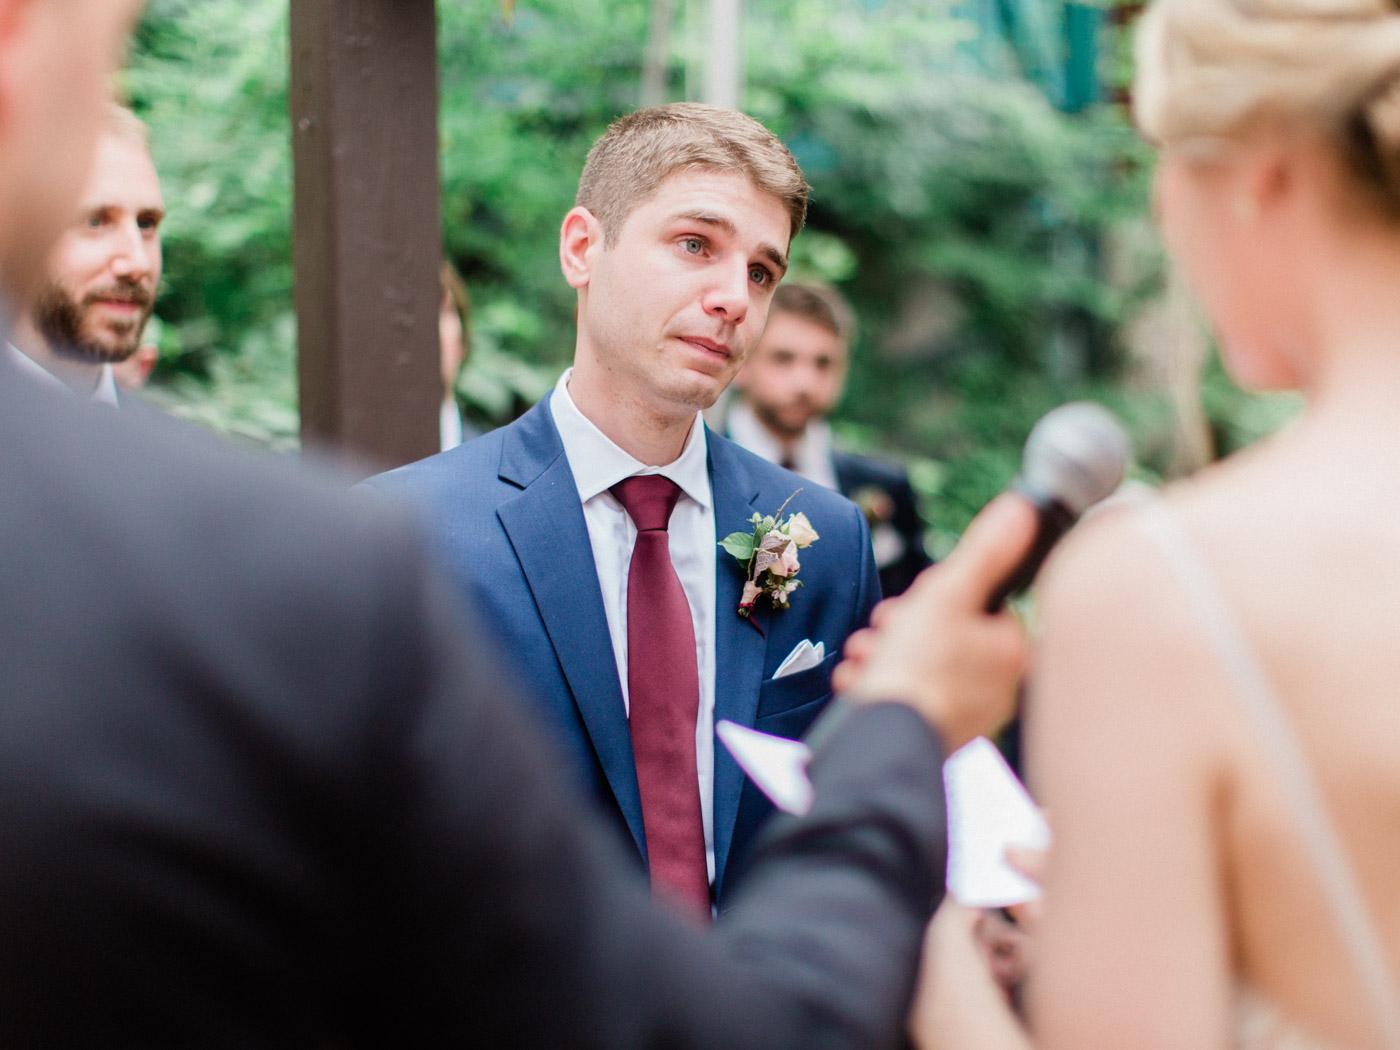 downtown-toronto-wedding-photographer-berkley-fieldhouse-blush-321.jpg